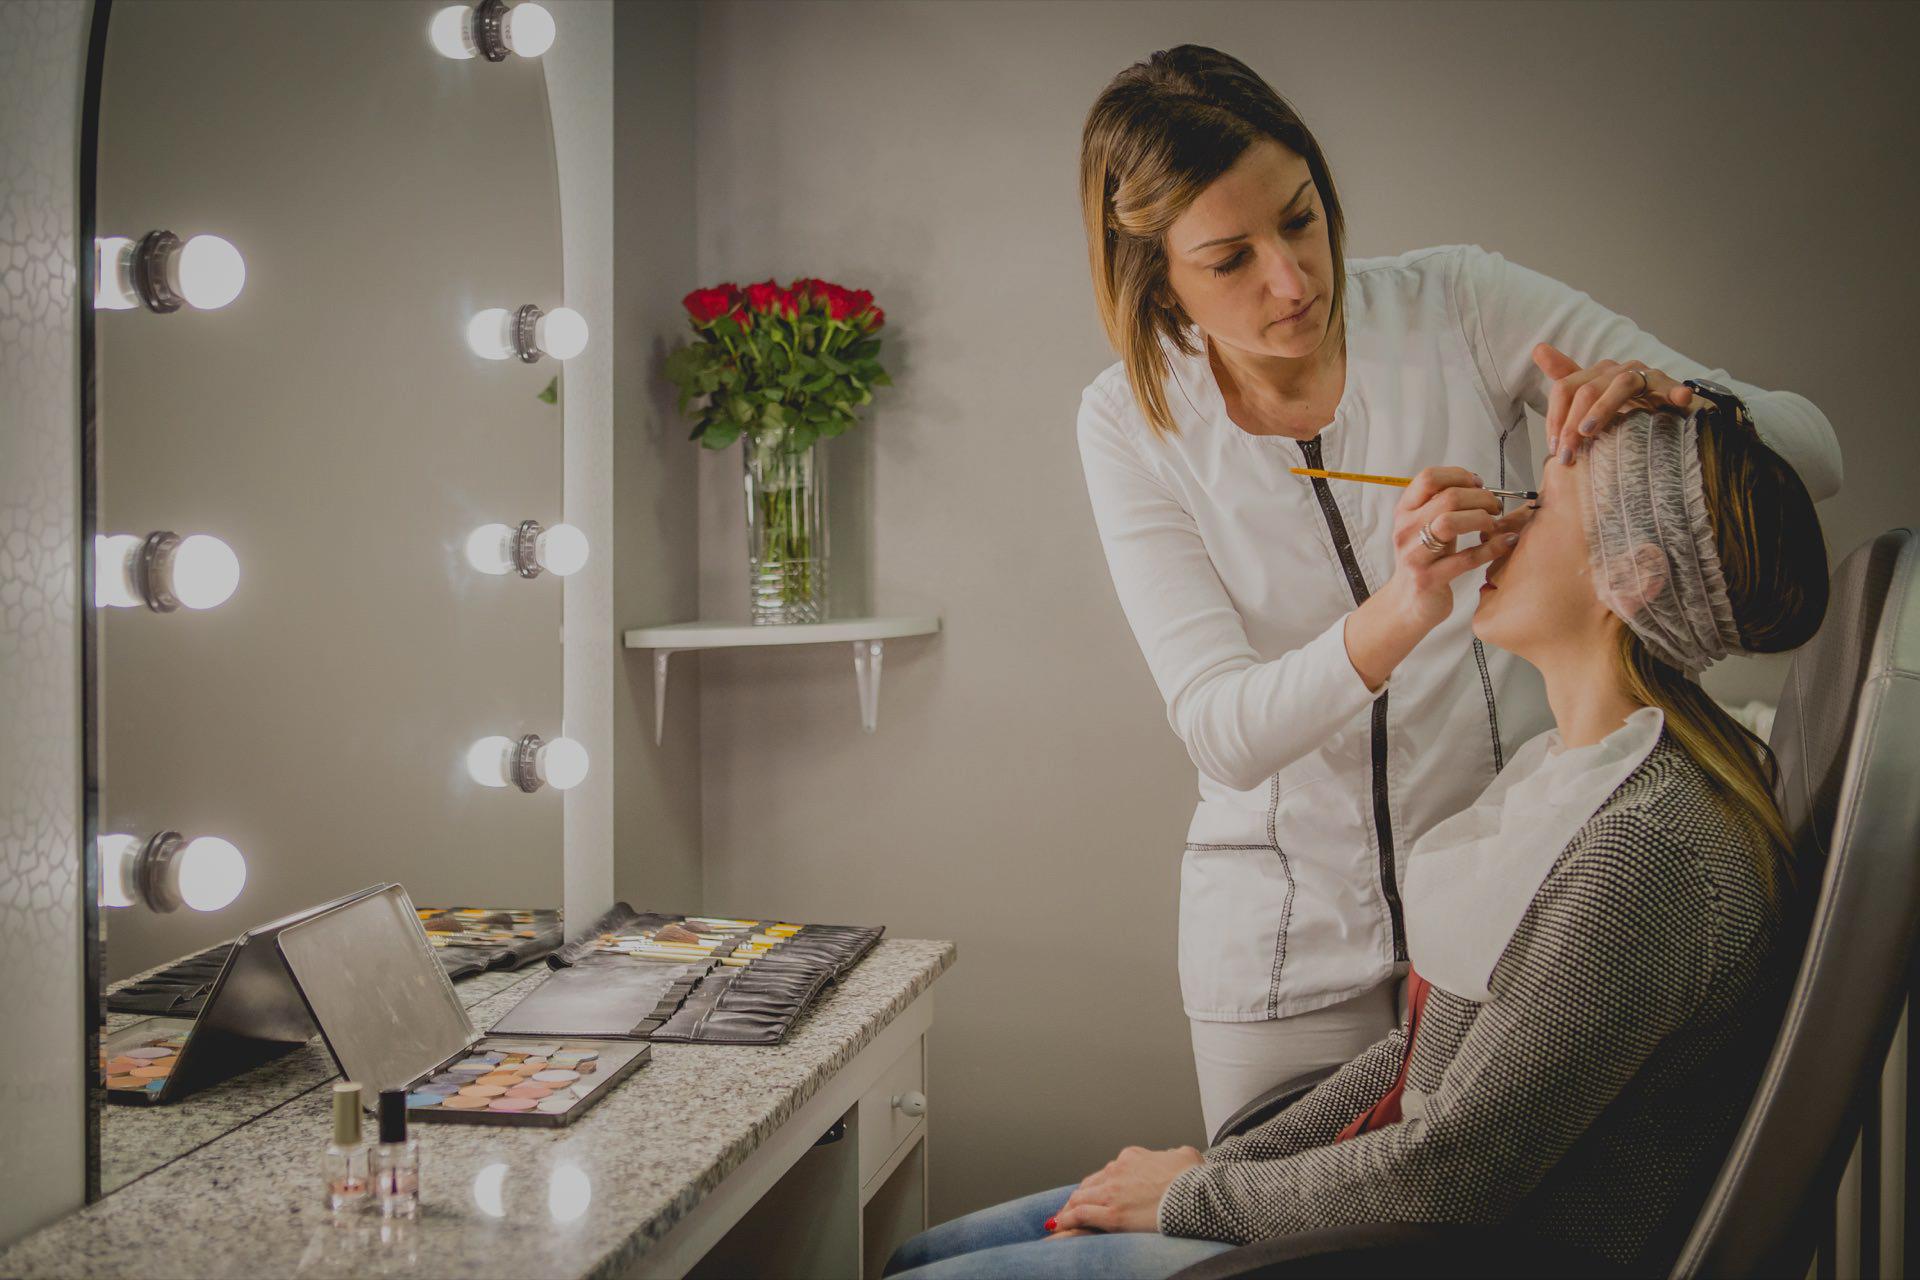 Centro Benessere Debora make-up